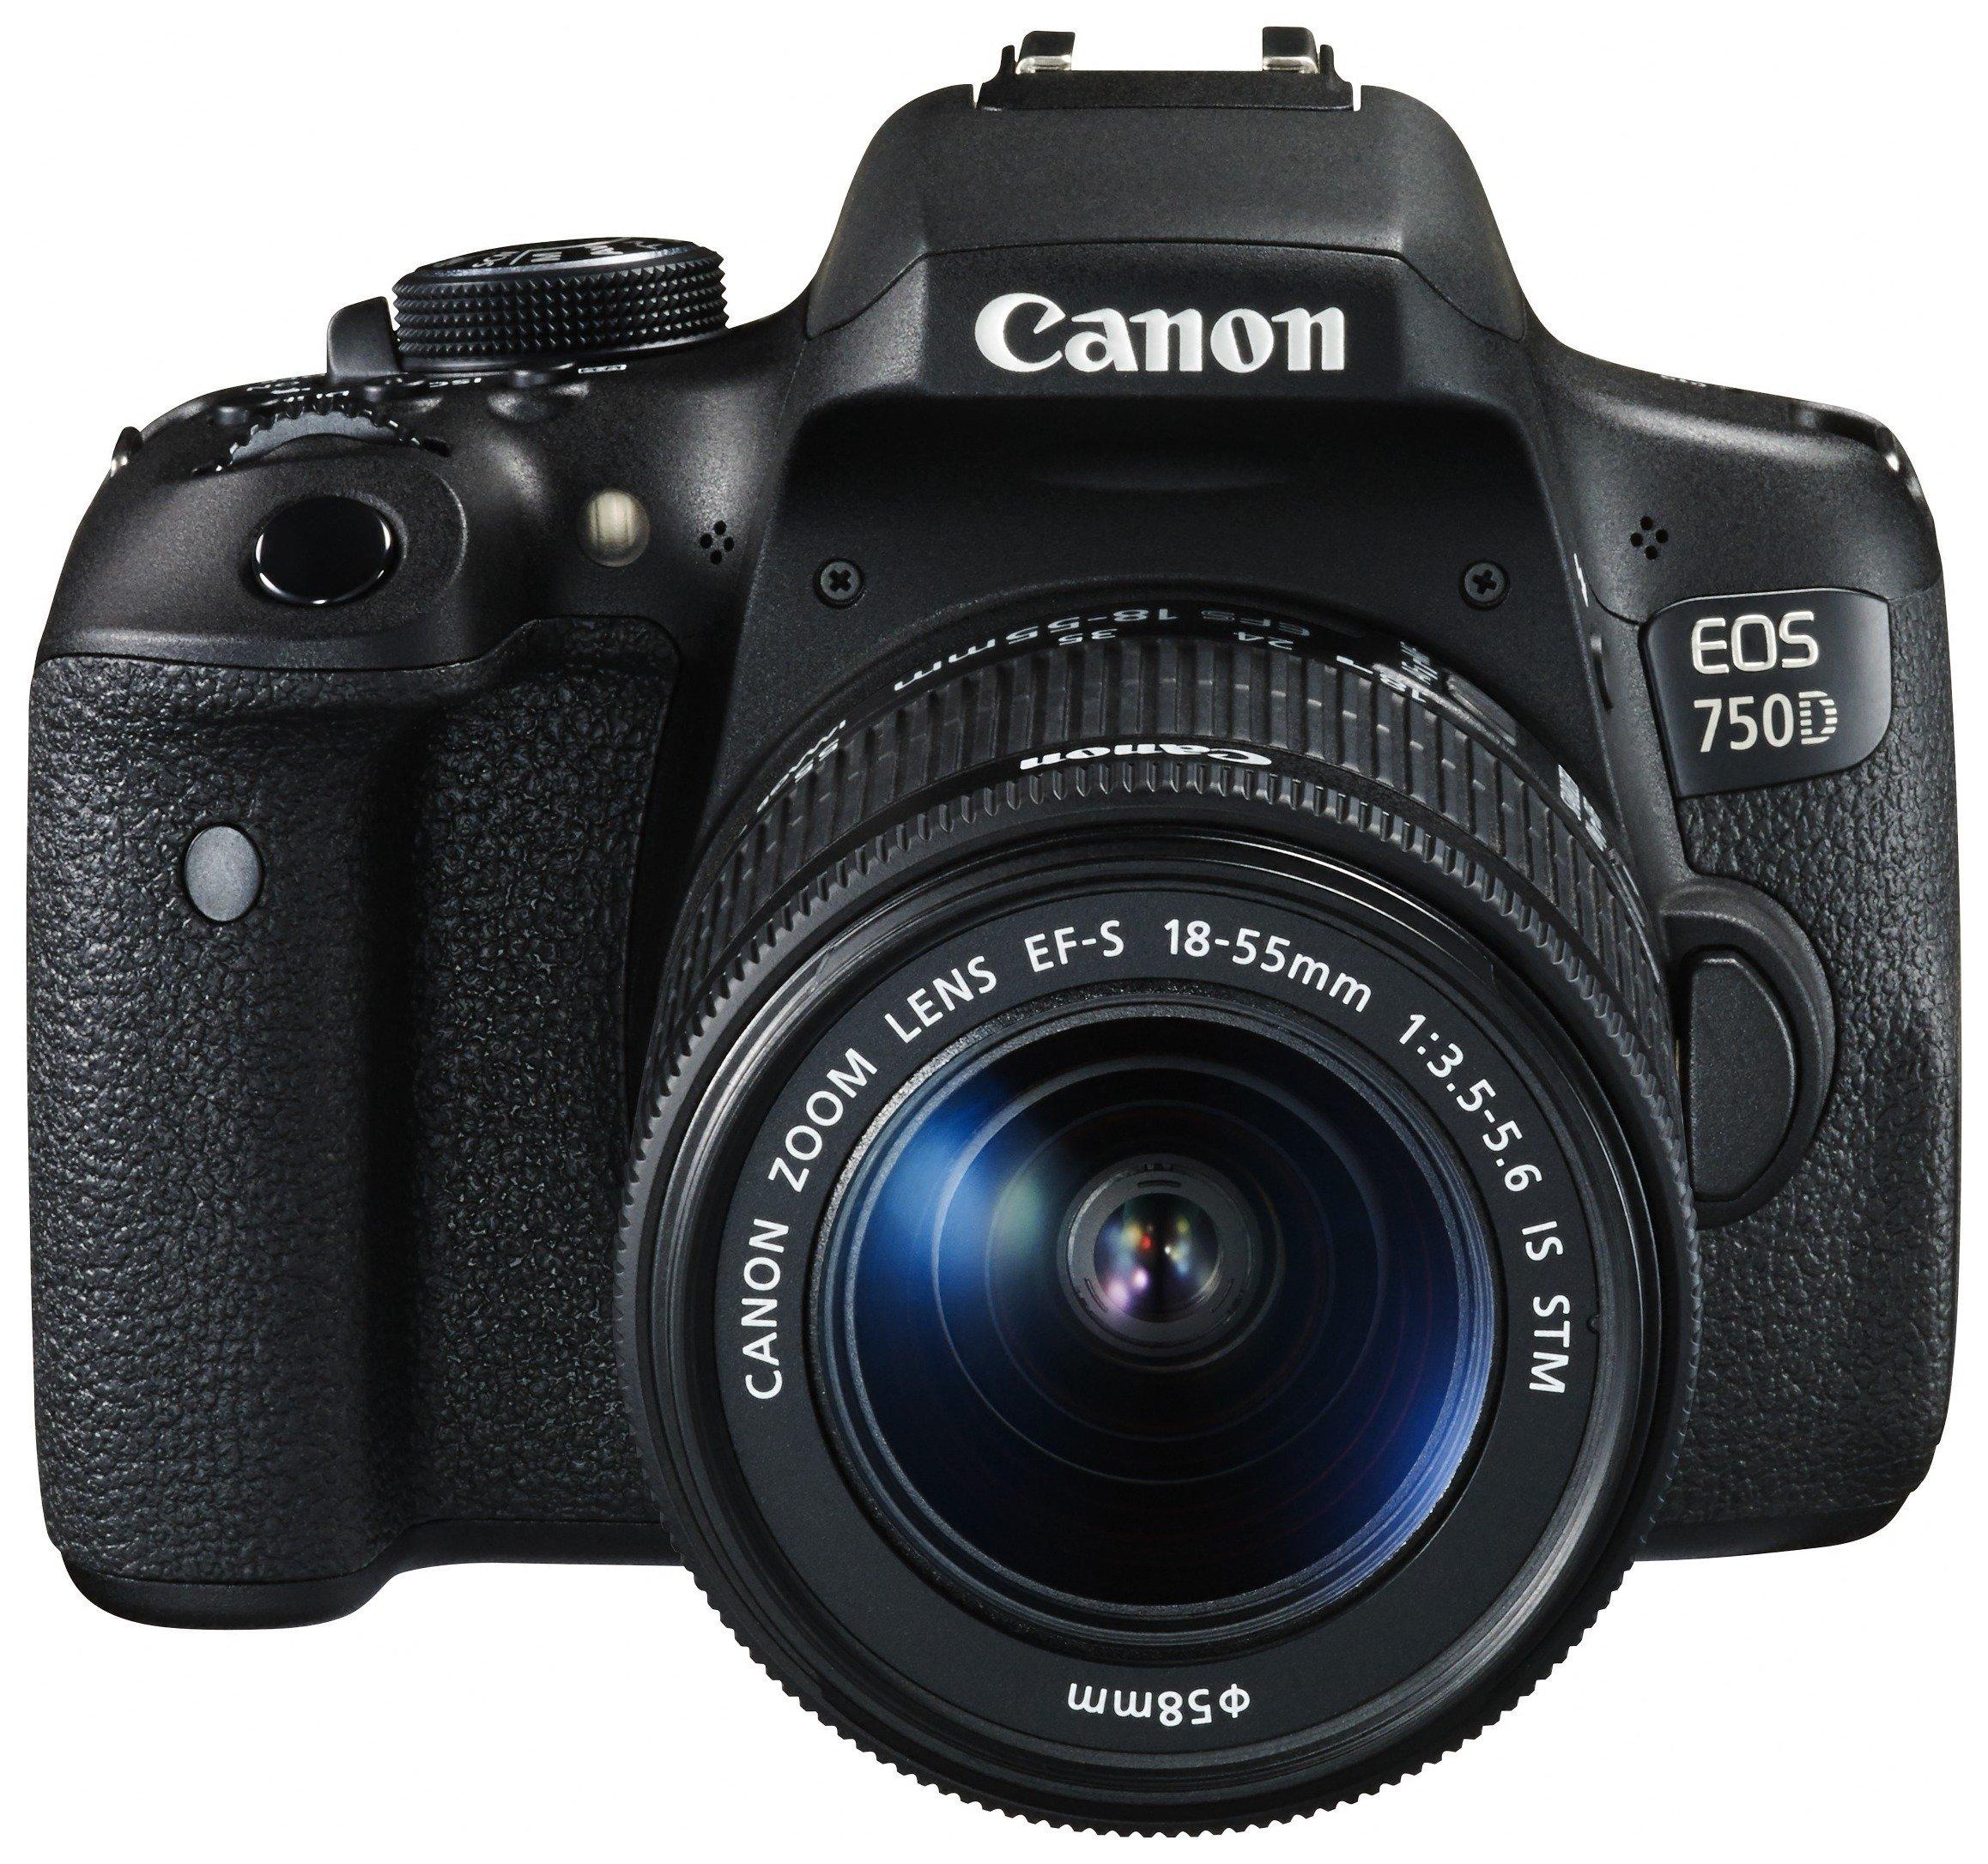 buy canon eos 750d dslr camera with 1855mm lens dslr